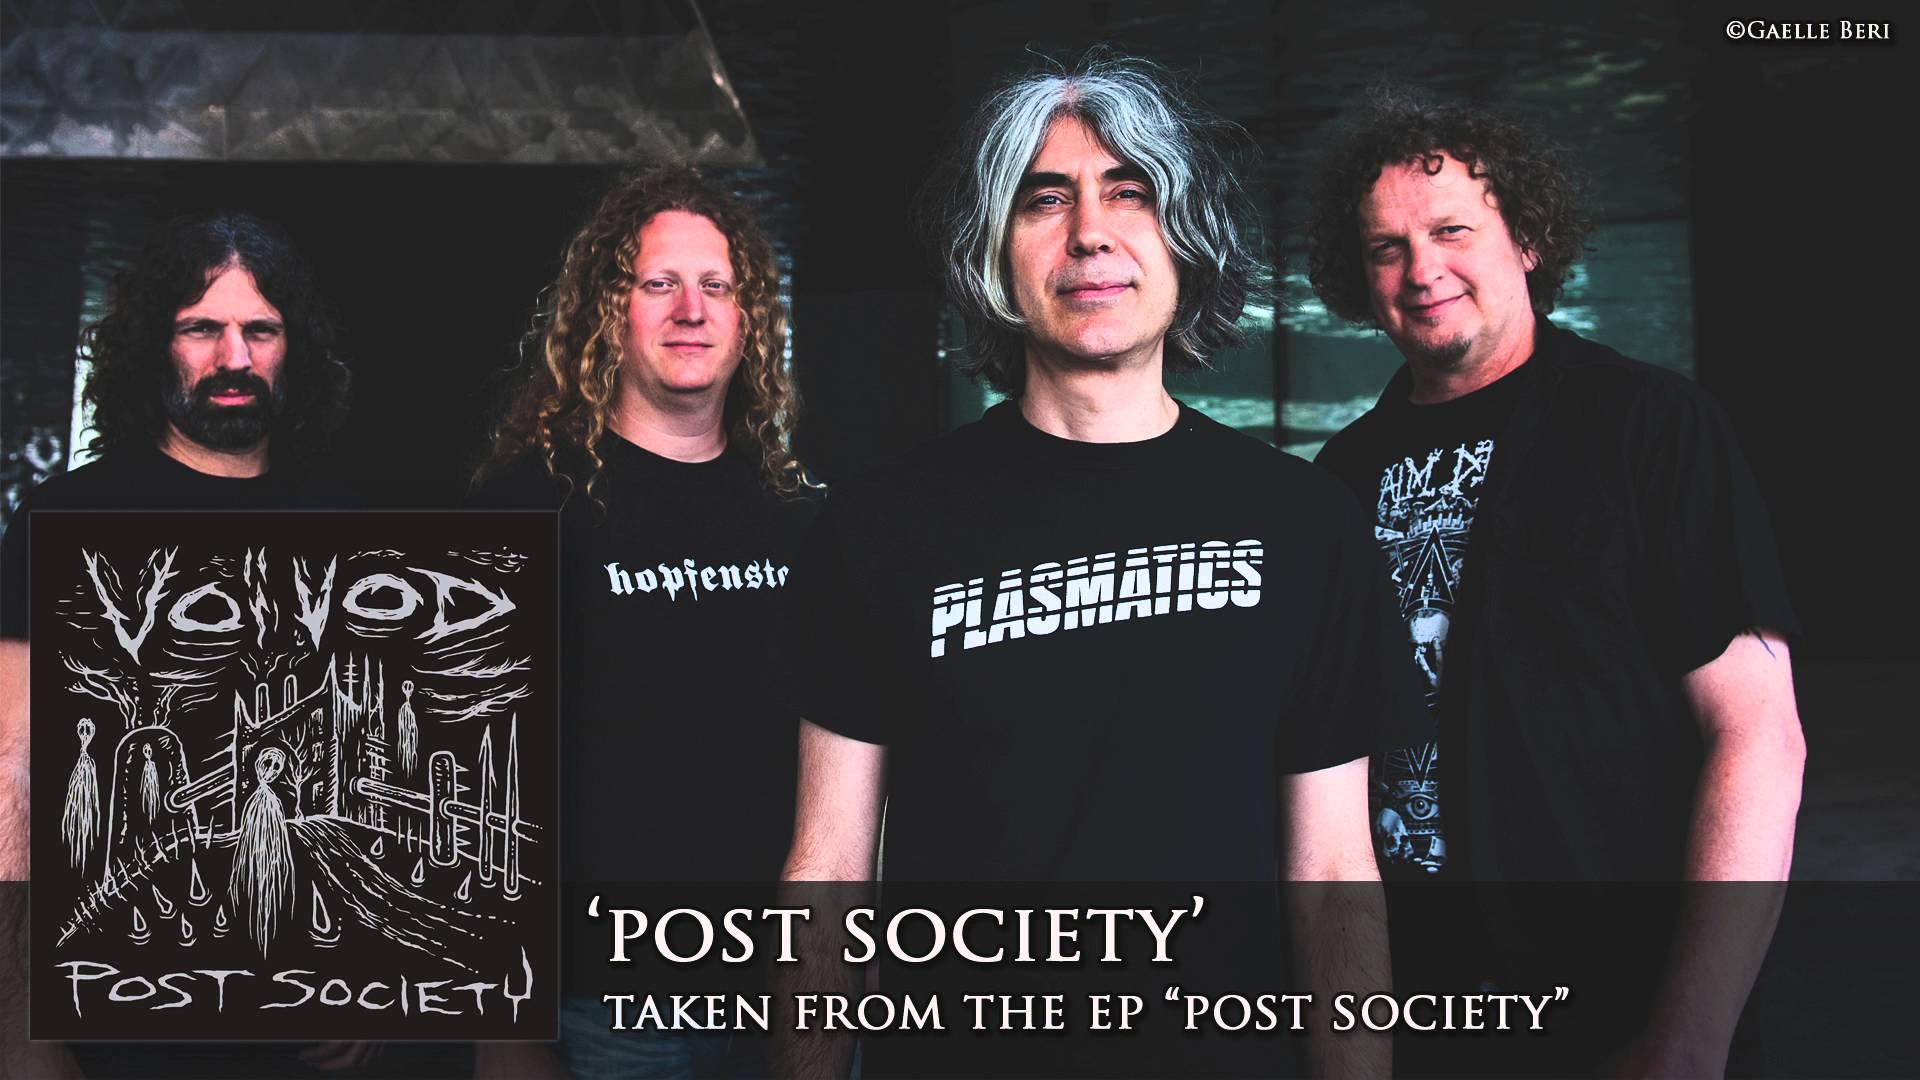 VOIVOD - Post Society (EP Track)